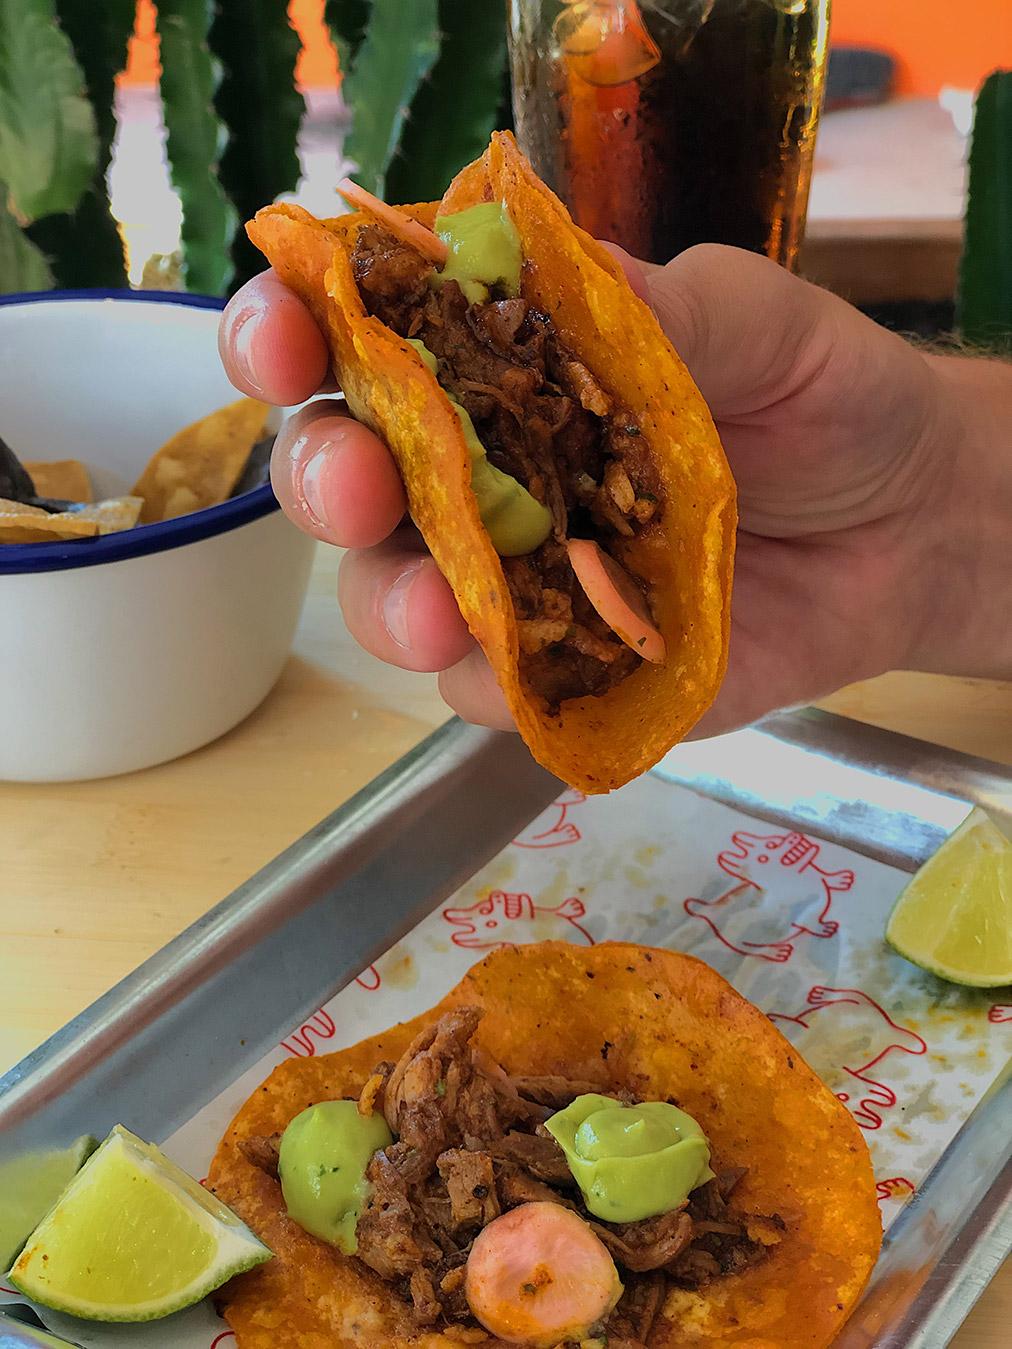 tacos - chihuahua tacos